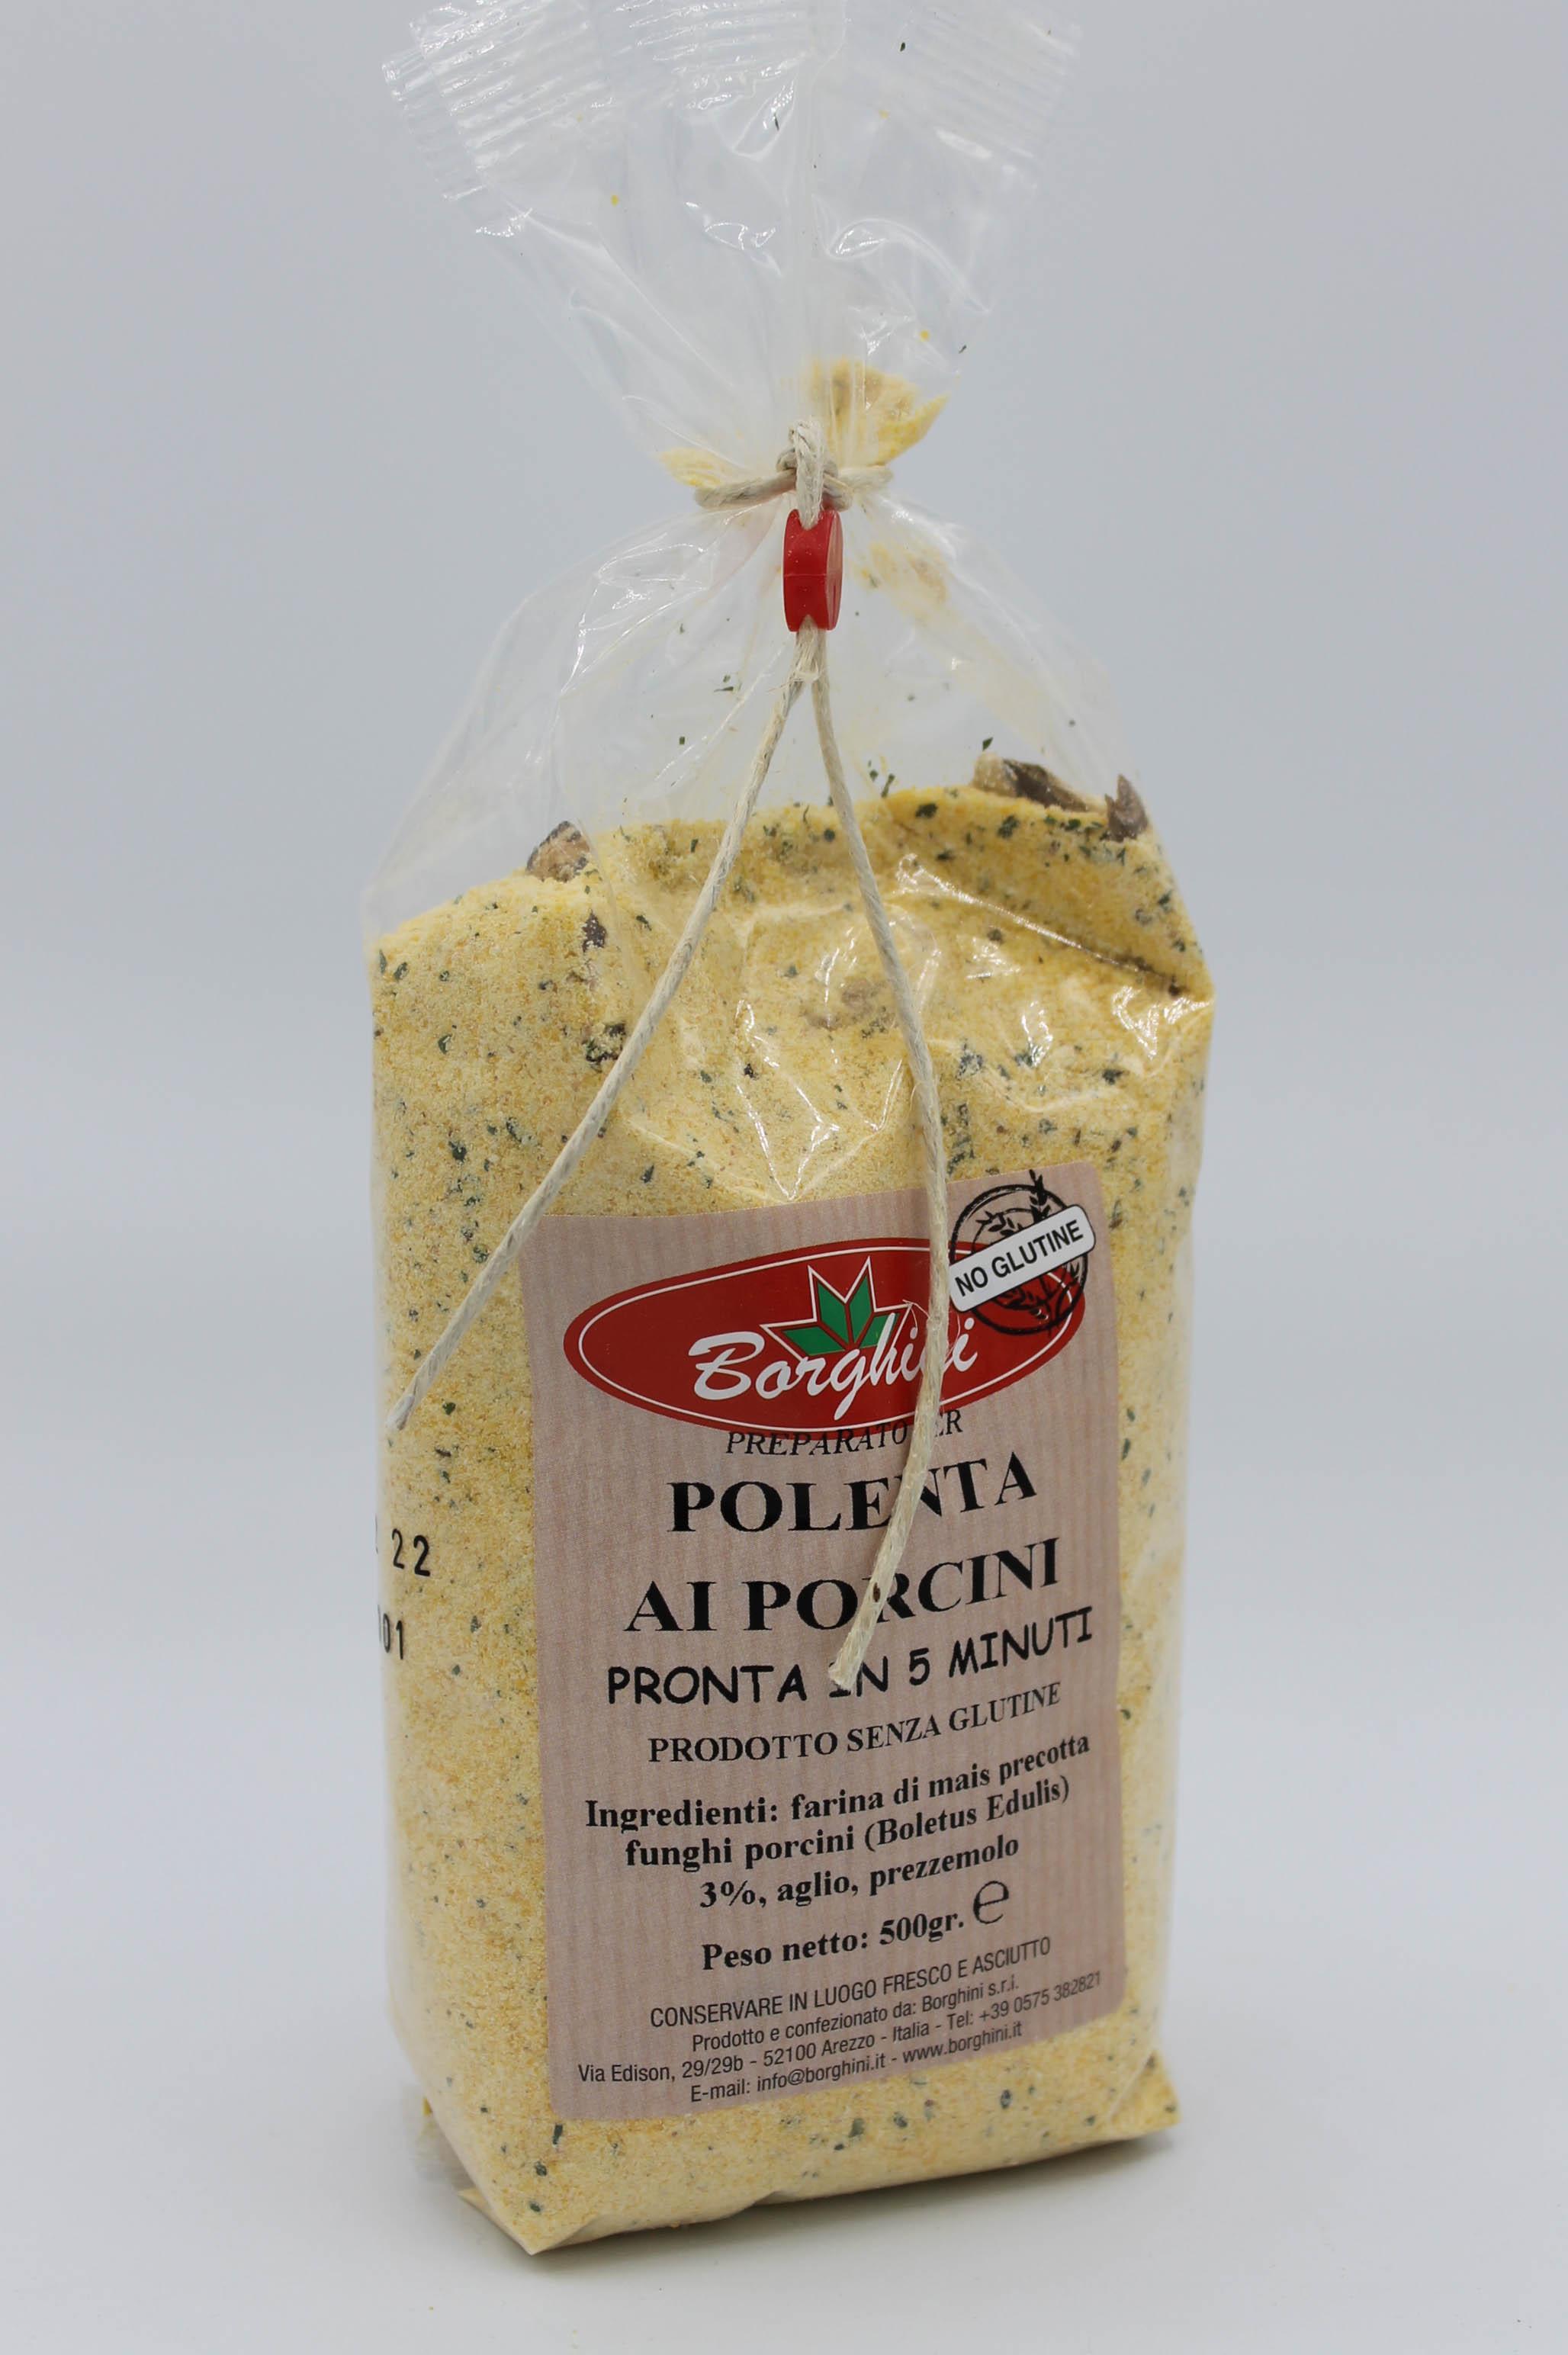 Borghini preparato polenta 500gr vari gusti.